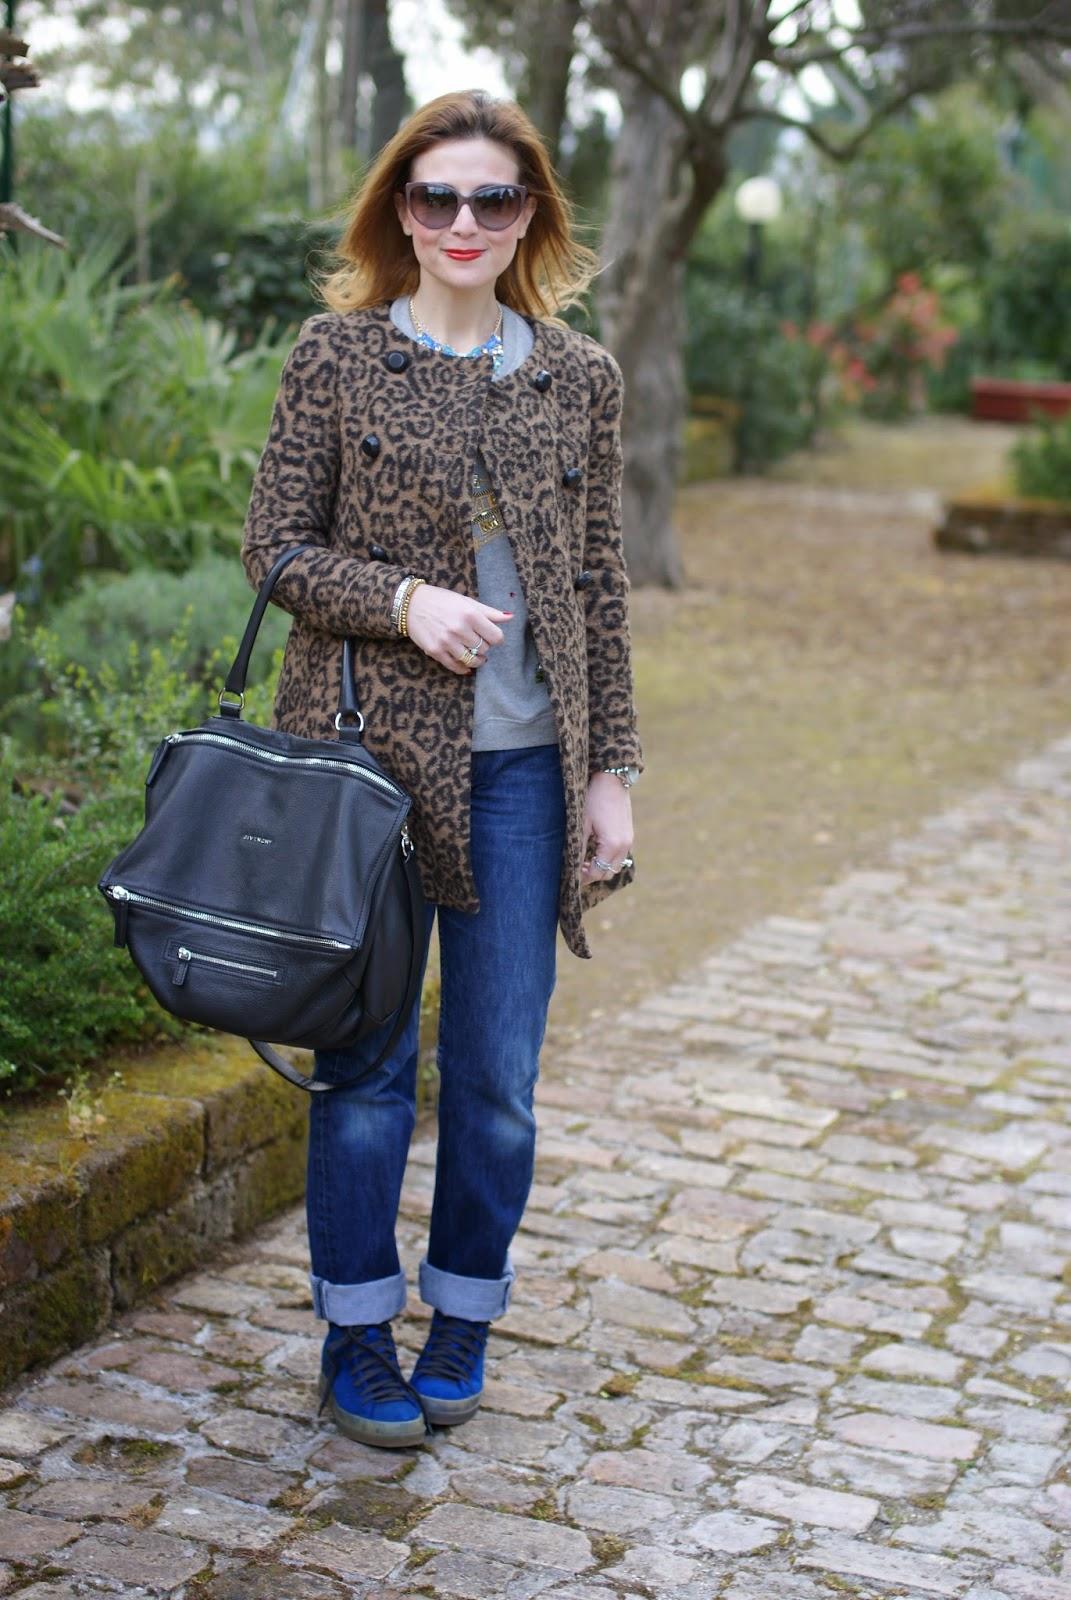 Givenchy Pandora grande, cappotto leopardato Zara, Ruco Line blue shoes, Fashion and Cookies, fashion blogger